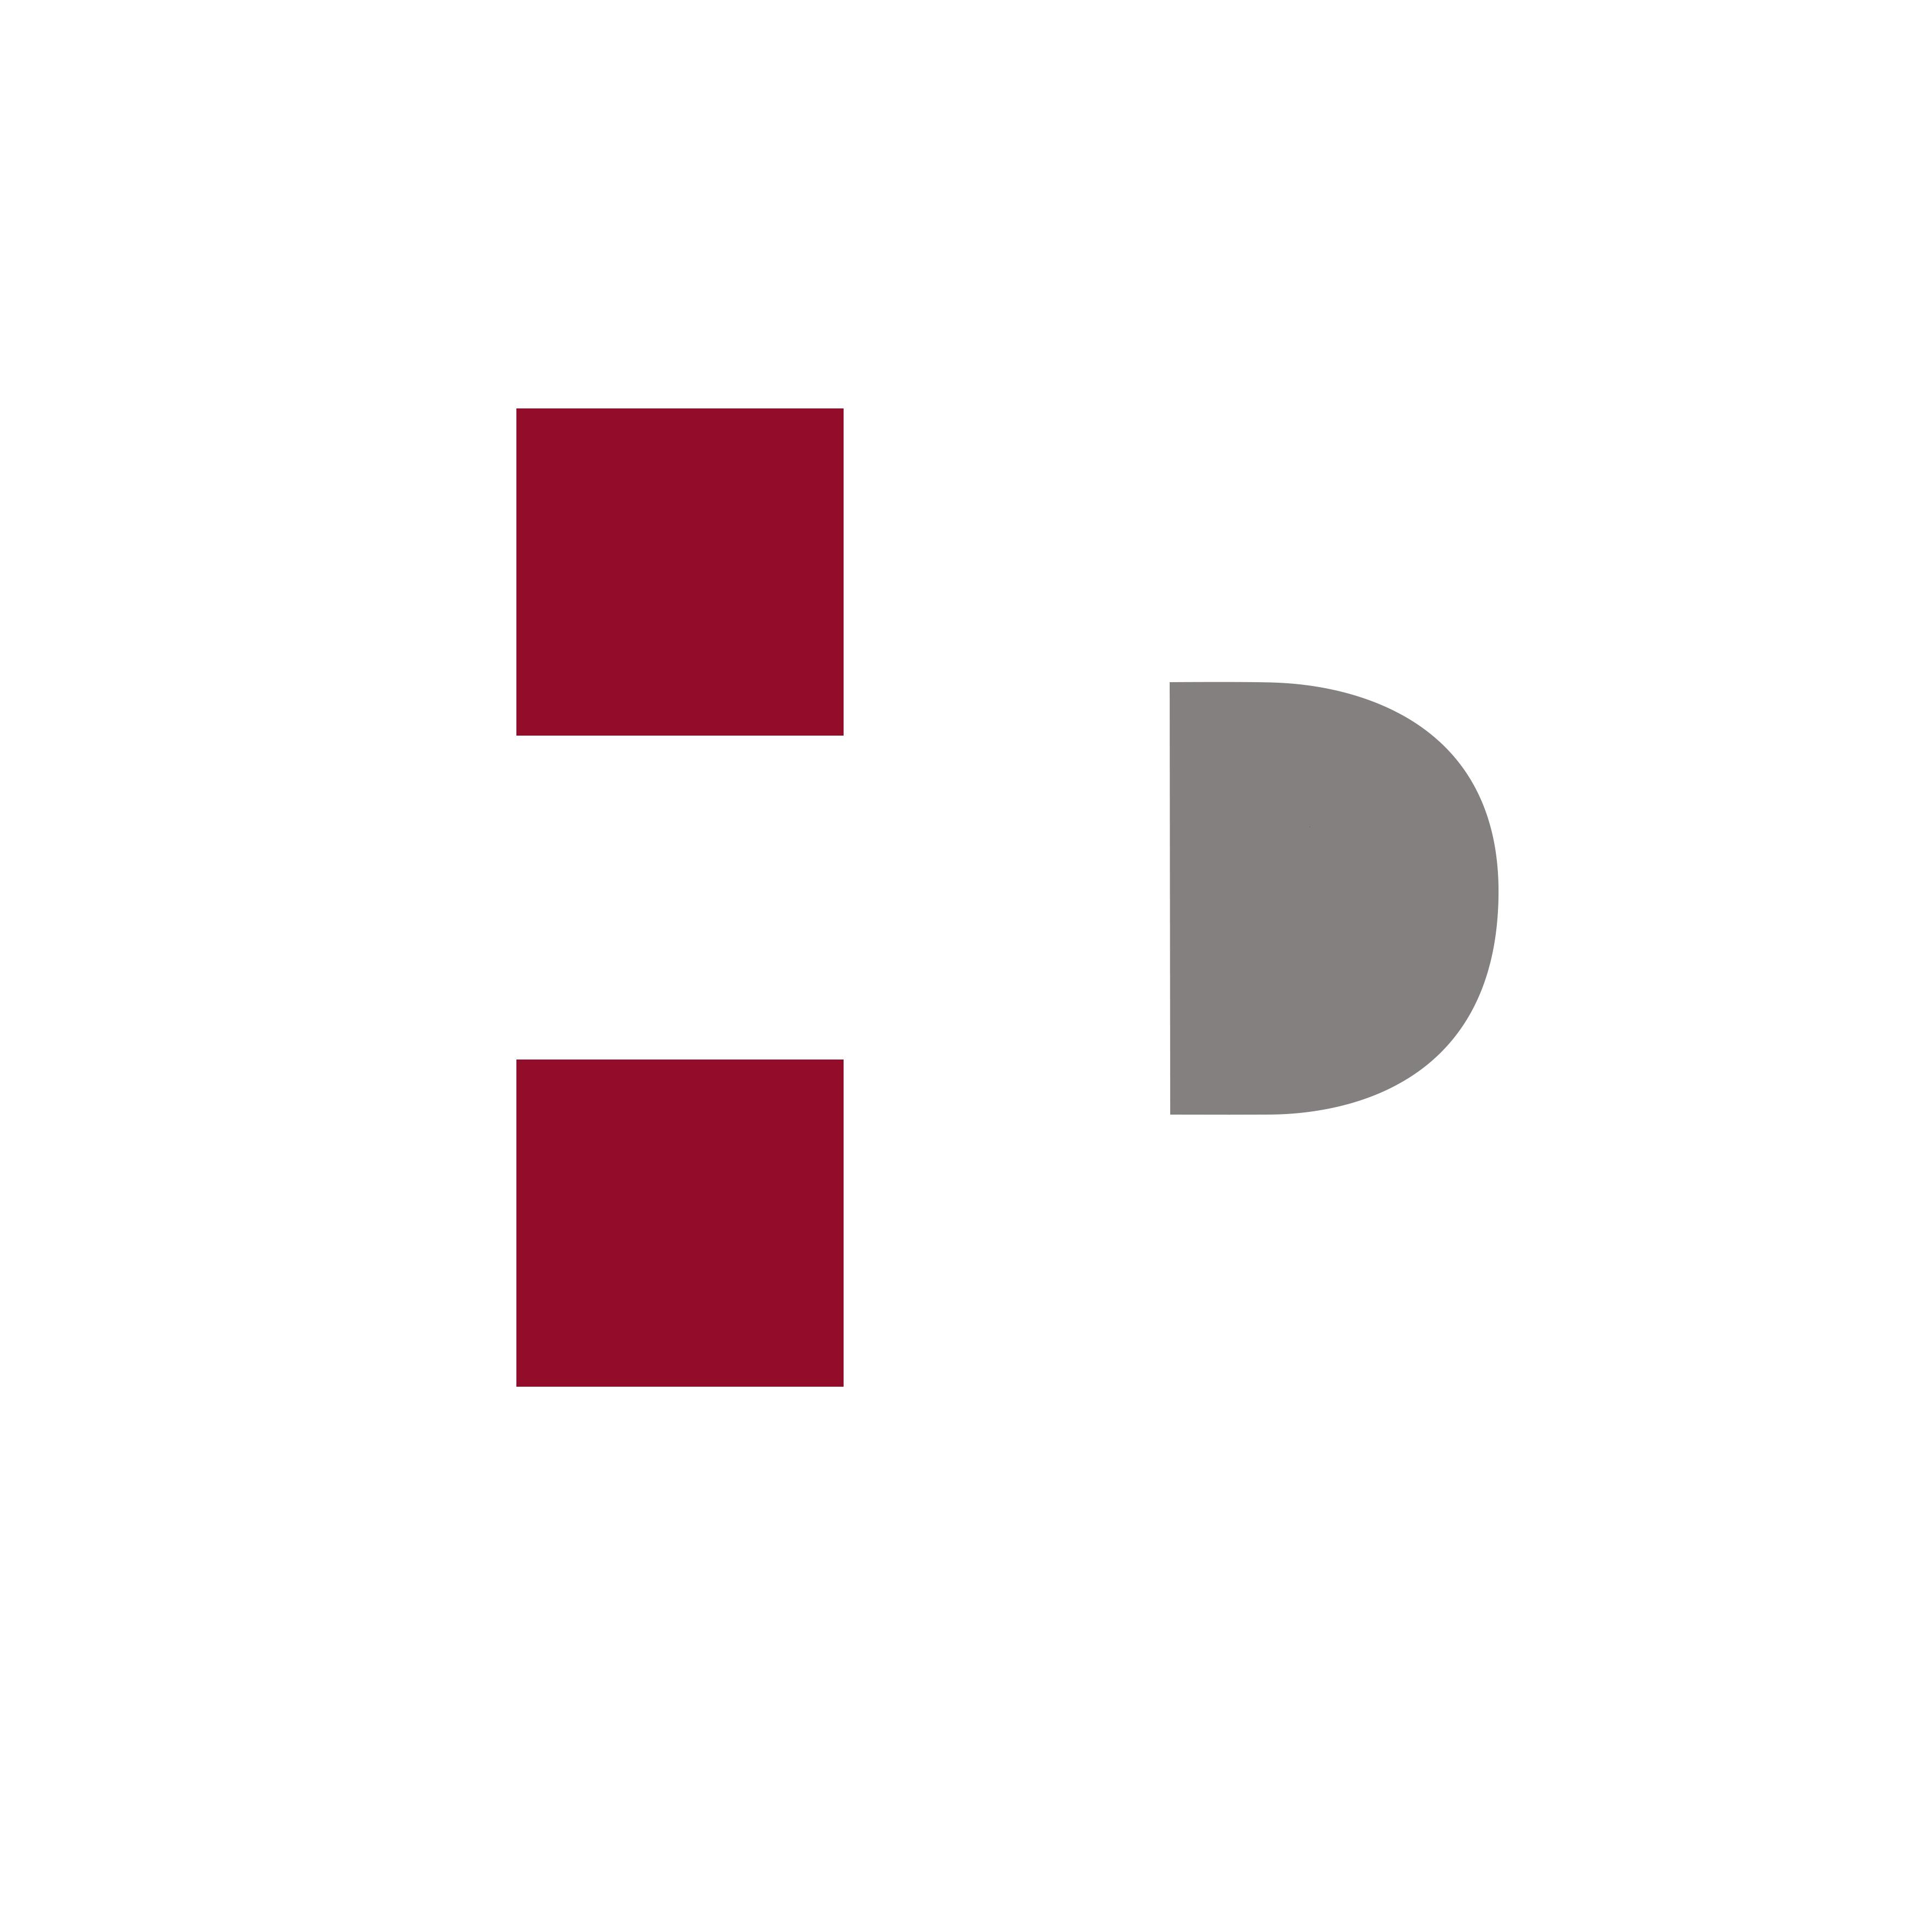 Digital Content Planner